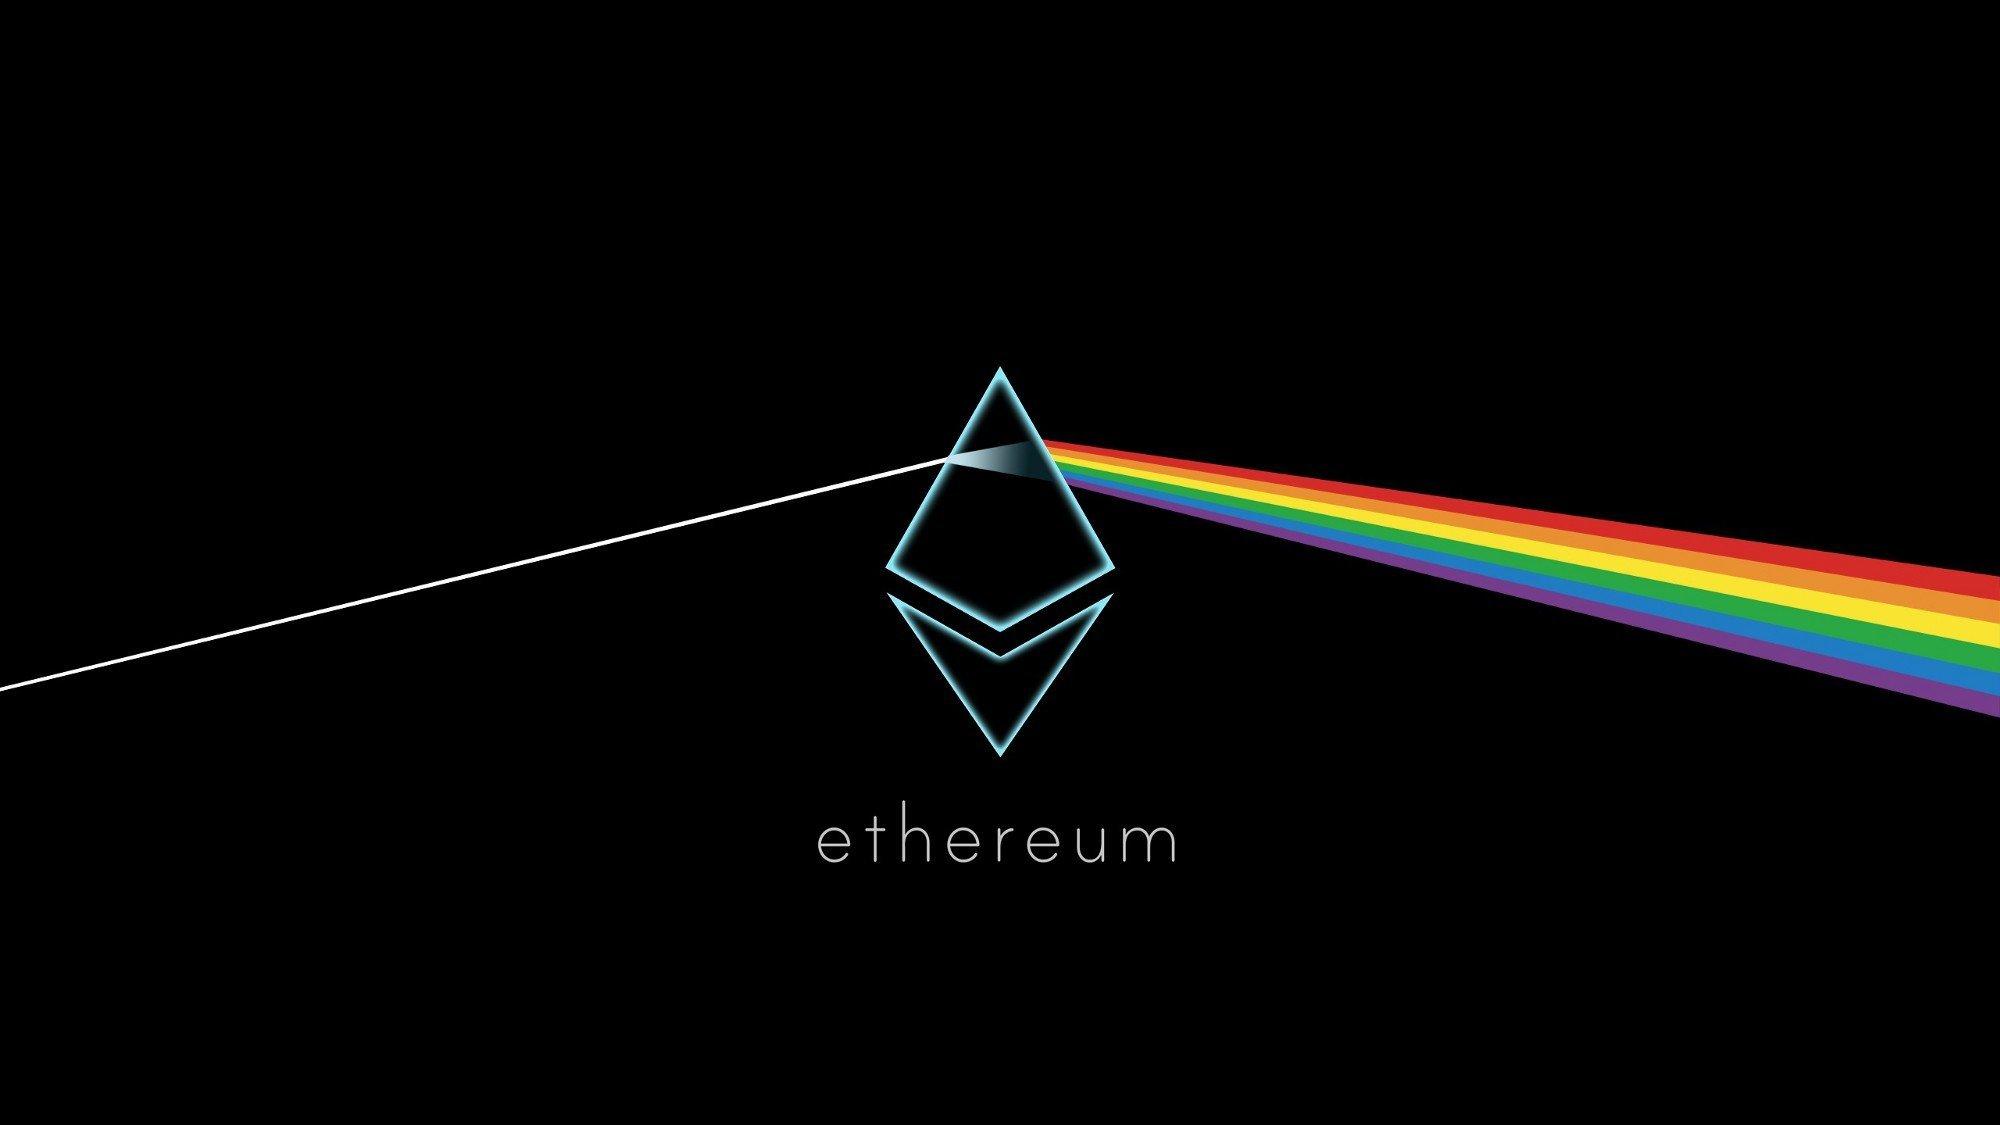 Ether, decentralizovaná digitálna mena